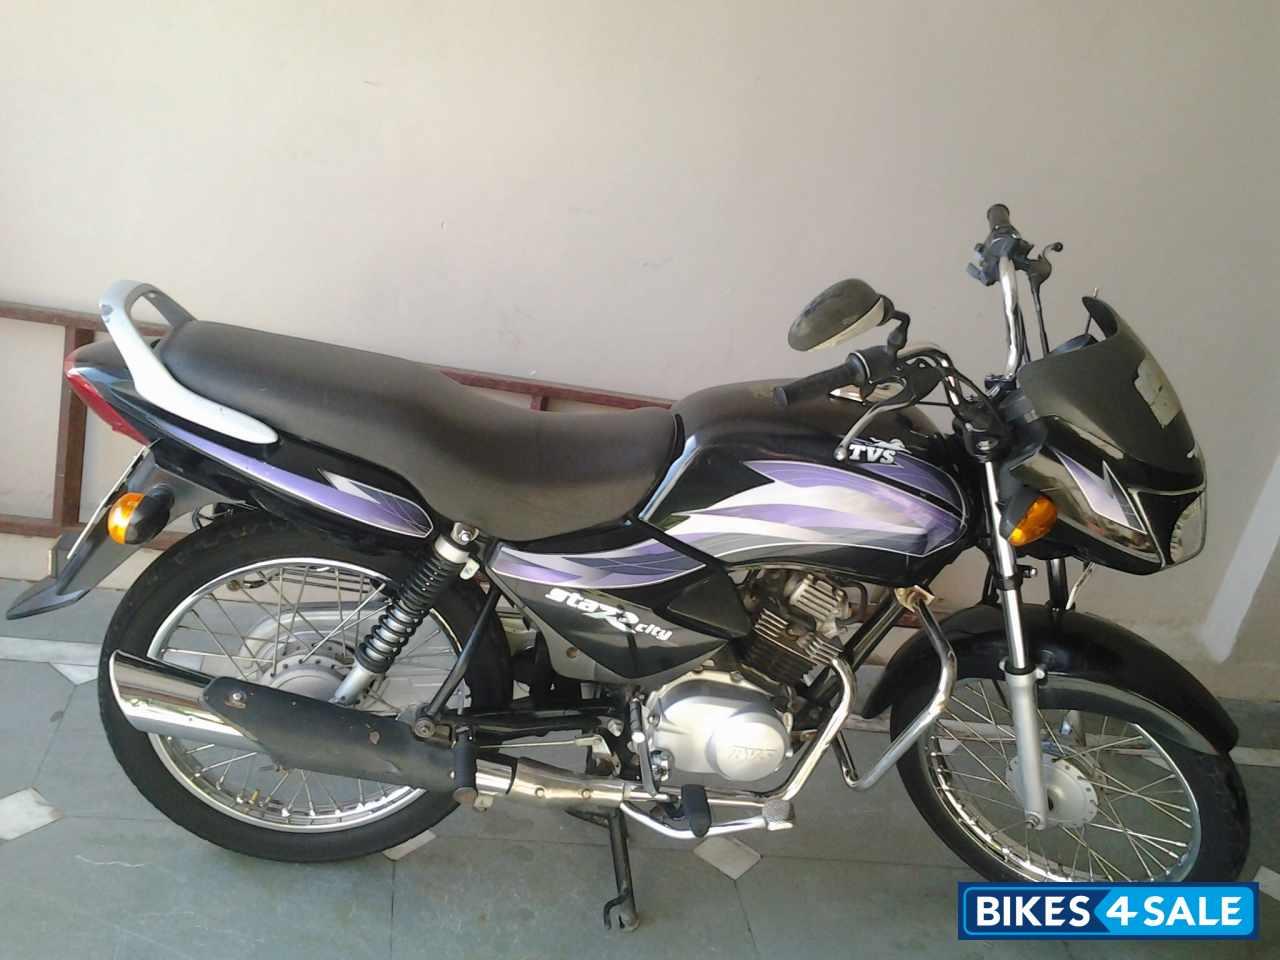 Tvs Star City Picture 1 Album Id Is 95686 Bike Located